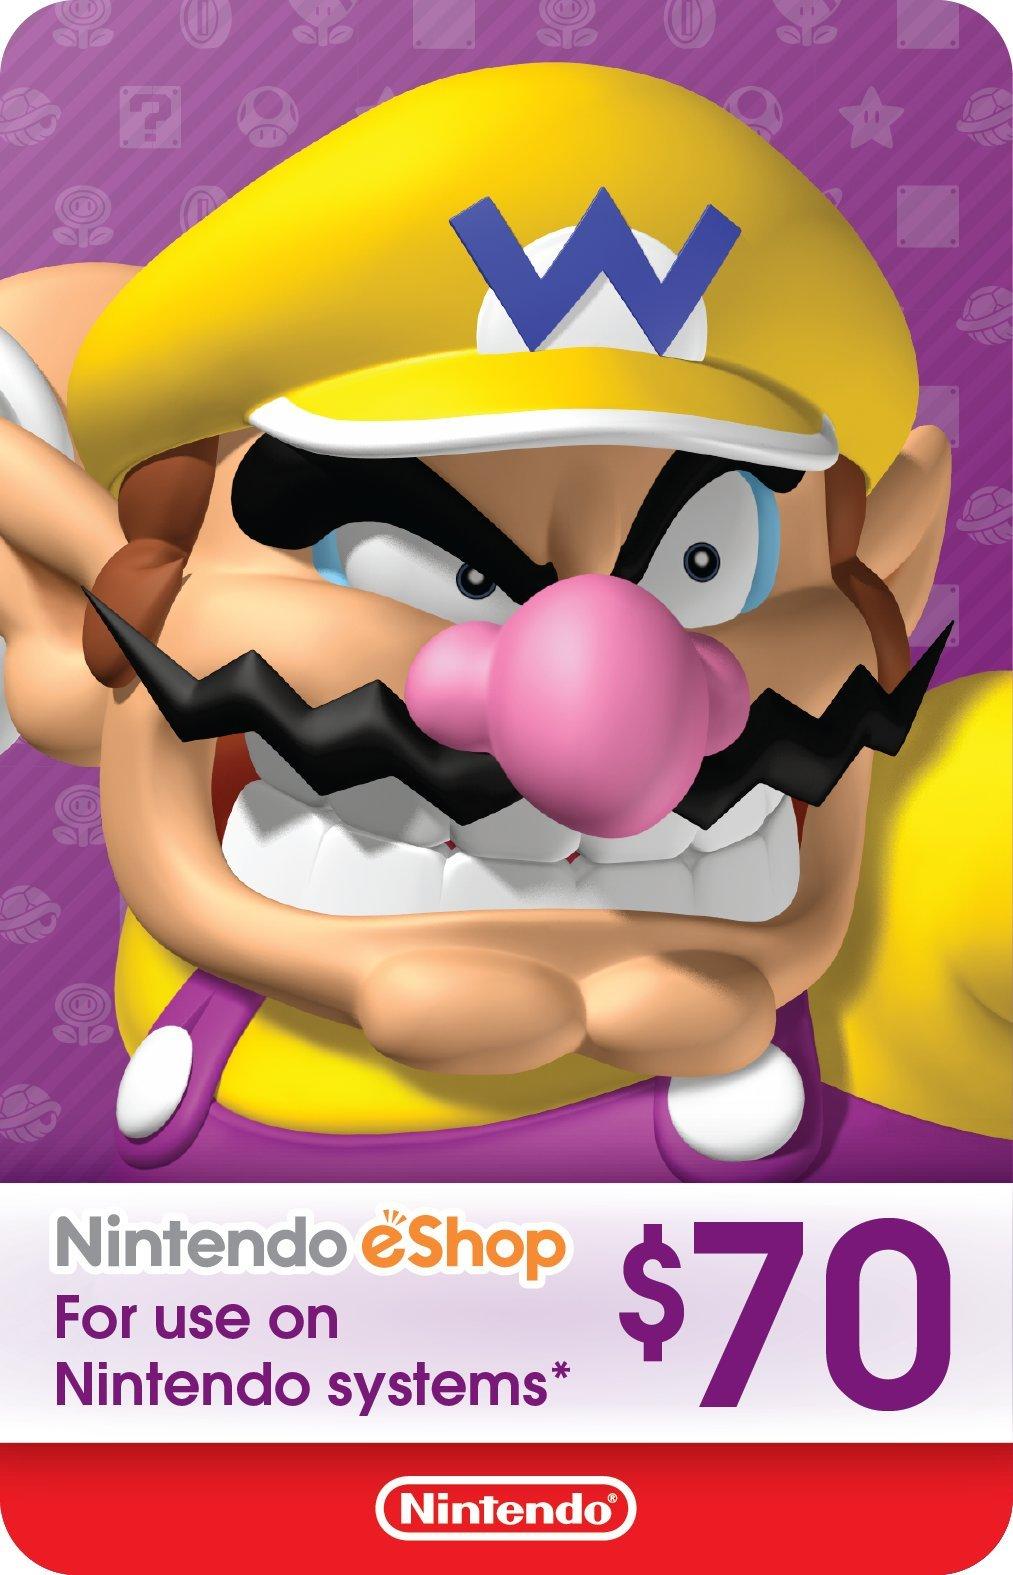 $70 Nintendo eShop Gift Card [Digital Code] by Nintendo (Image #1)